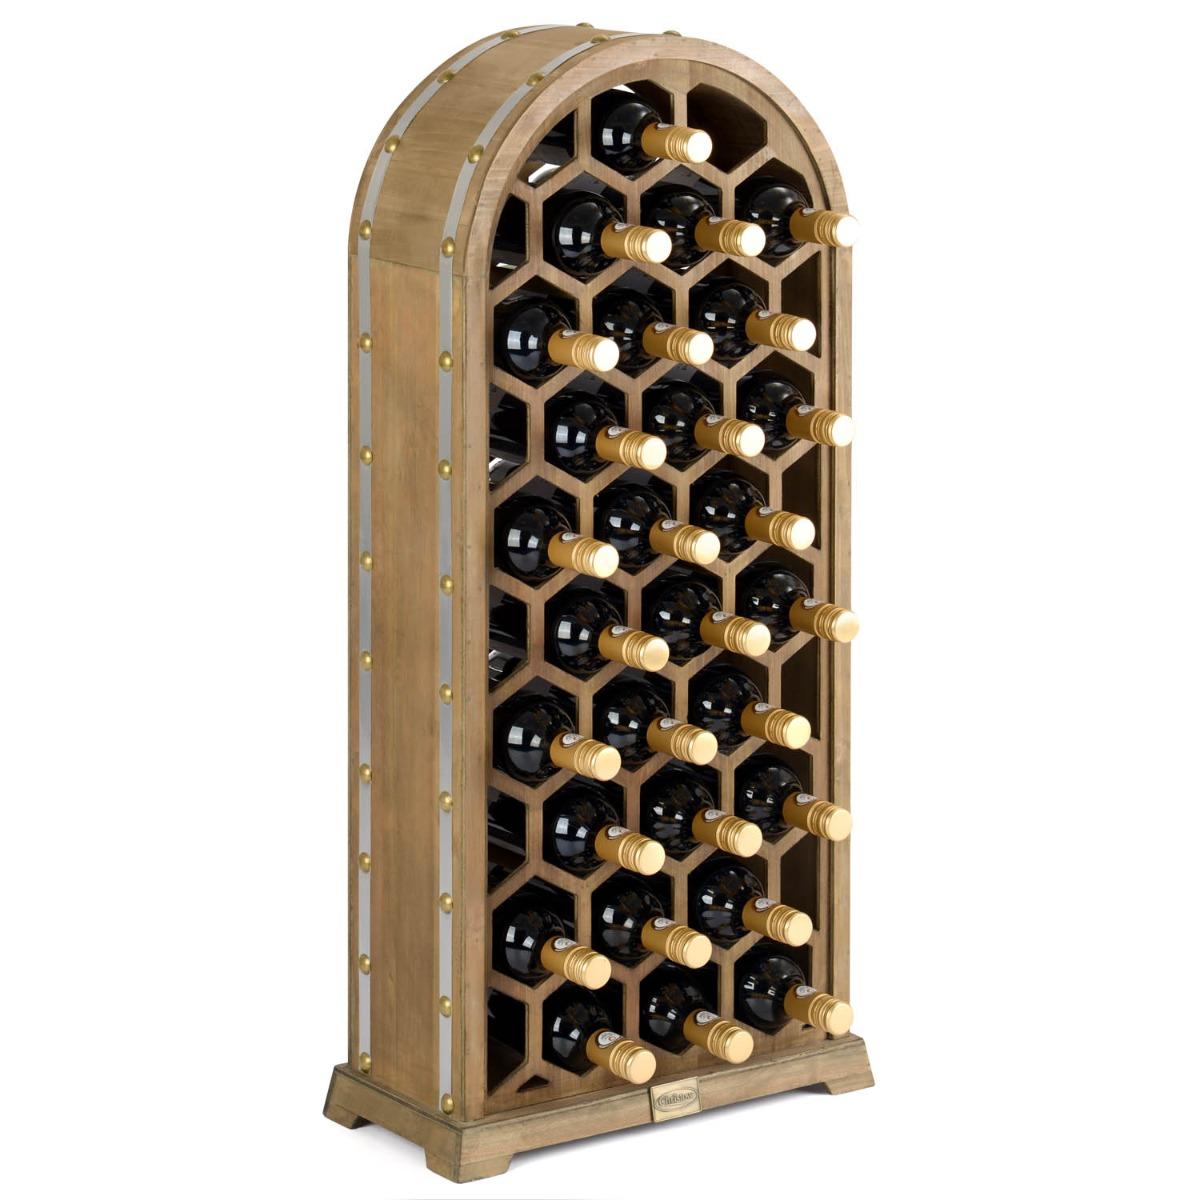 Image of 28 Bottle Honeycomb Wine Rack